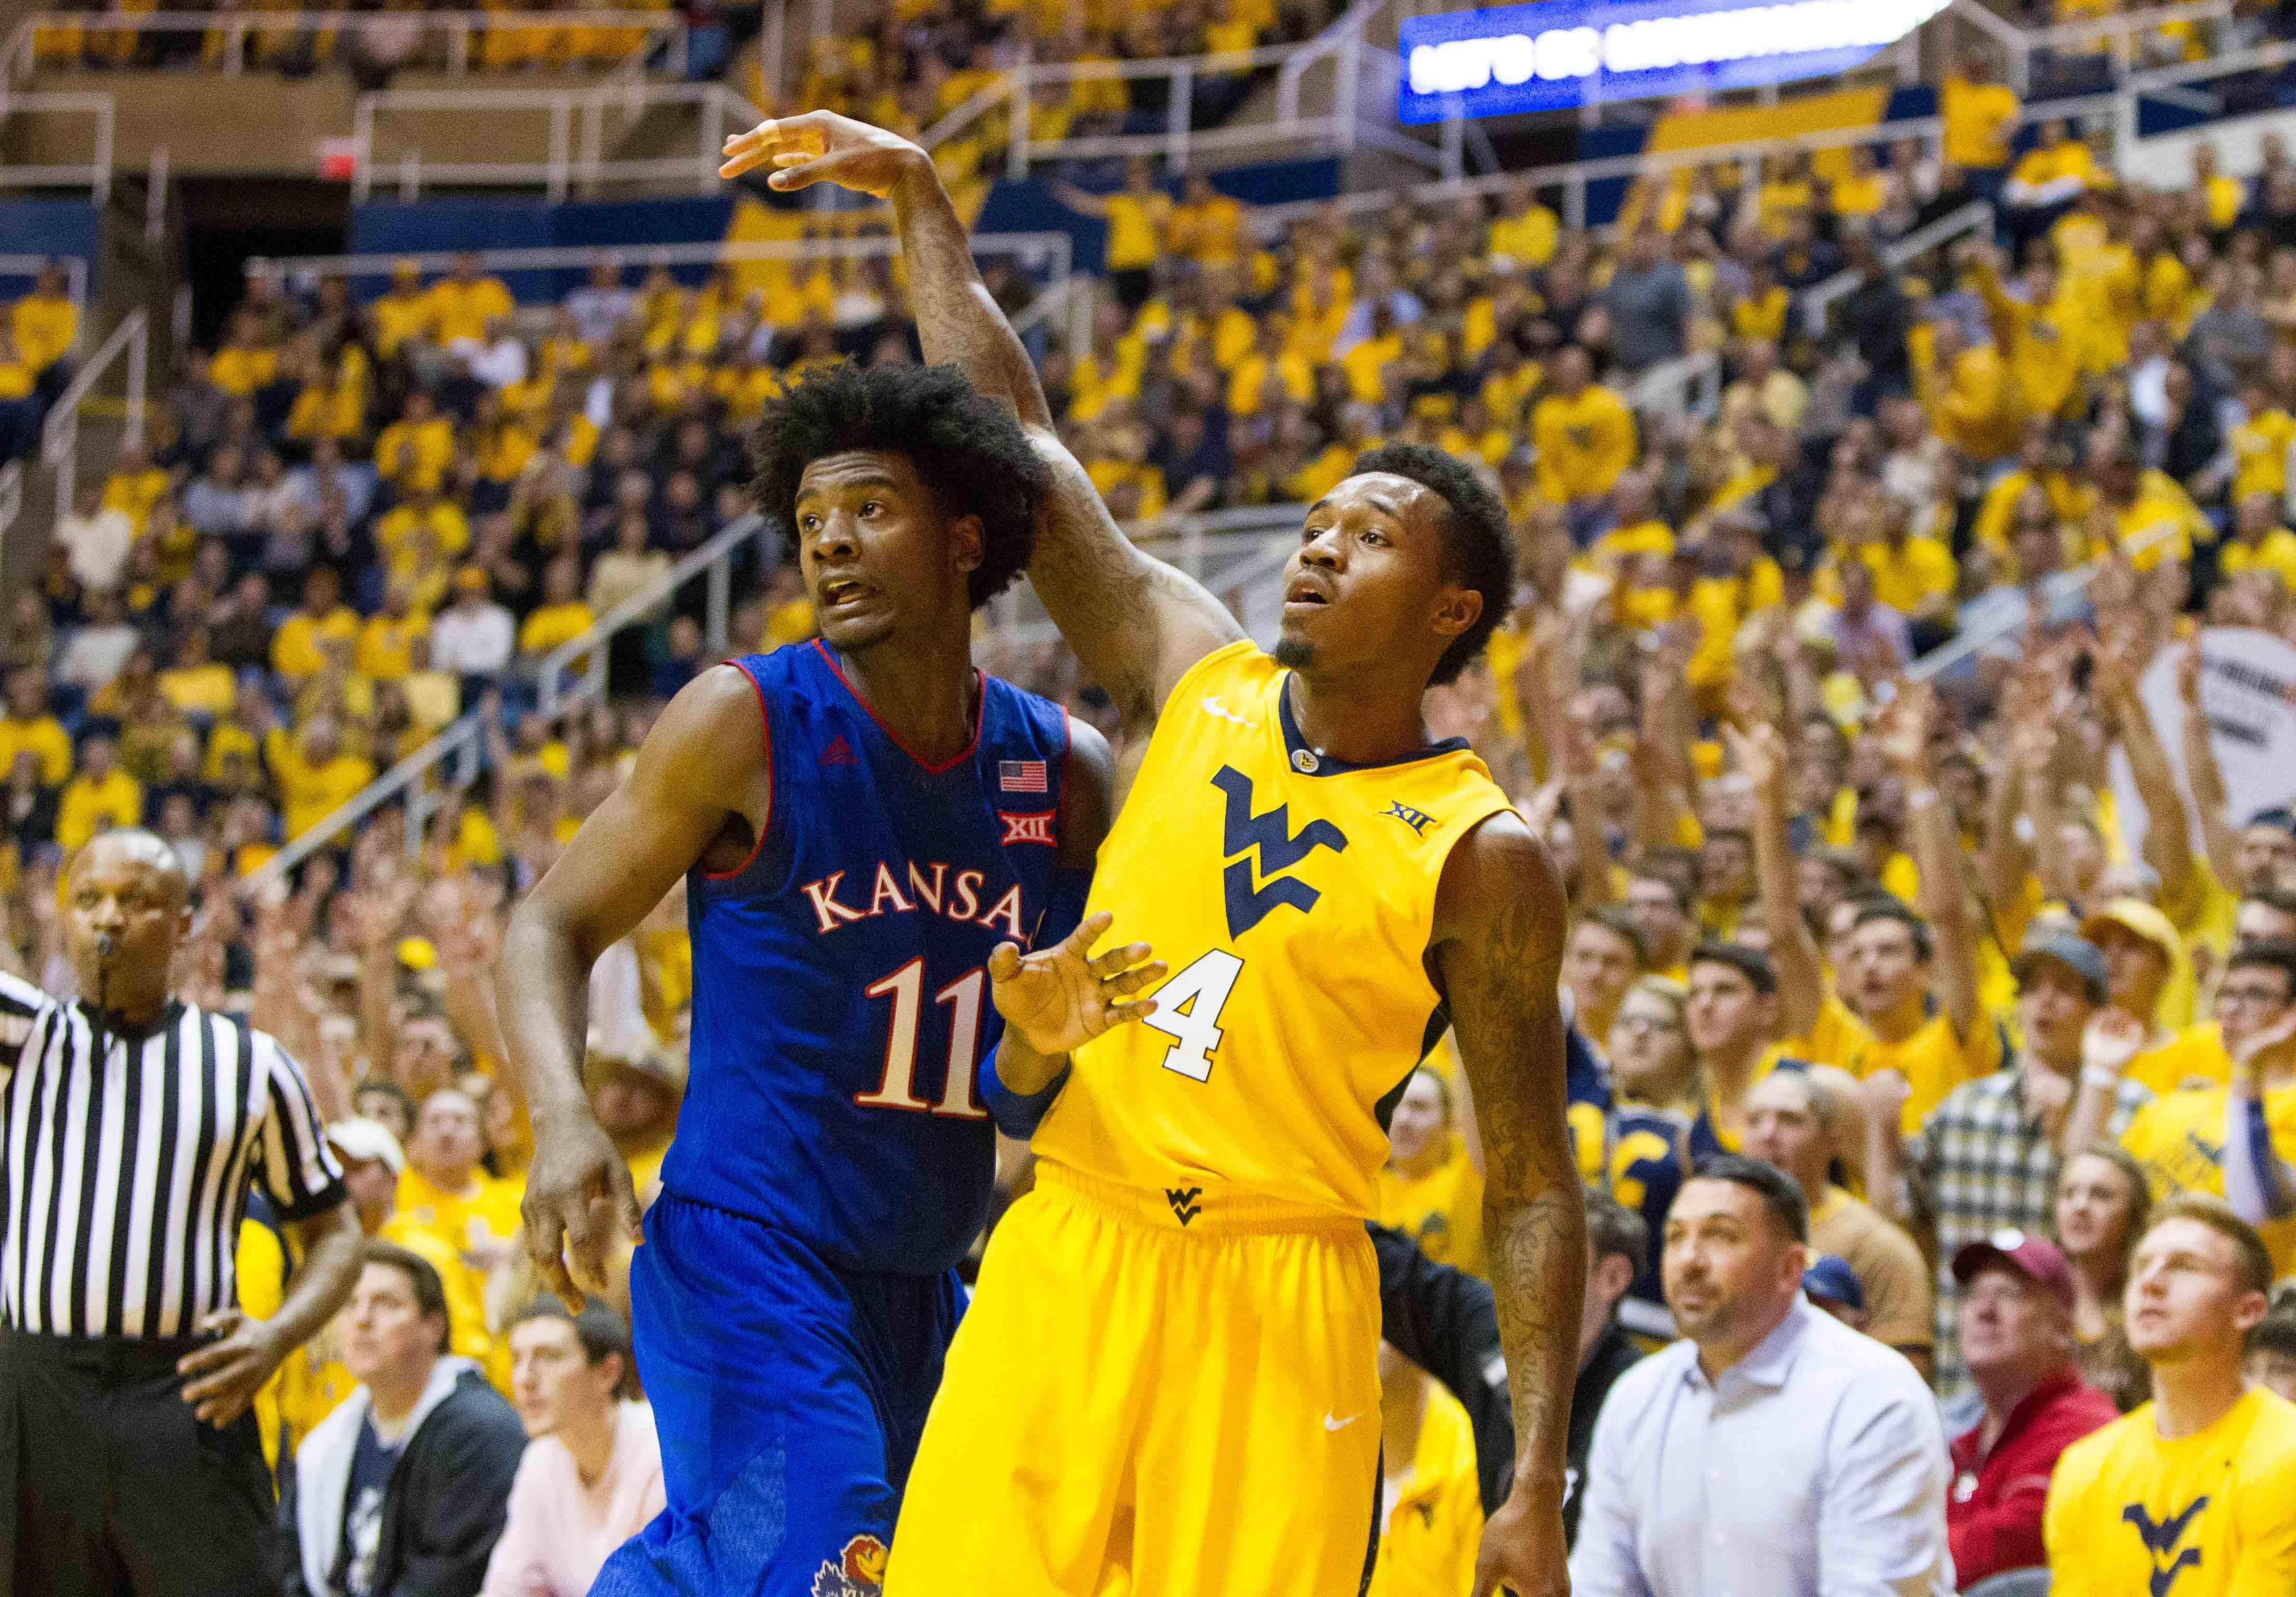 Uk Basketball: How To Watch Kansas Jayhawks Basketball At Kentucky